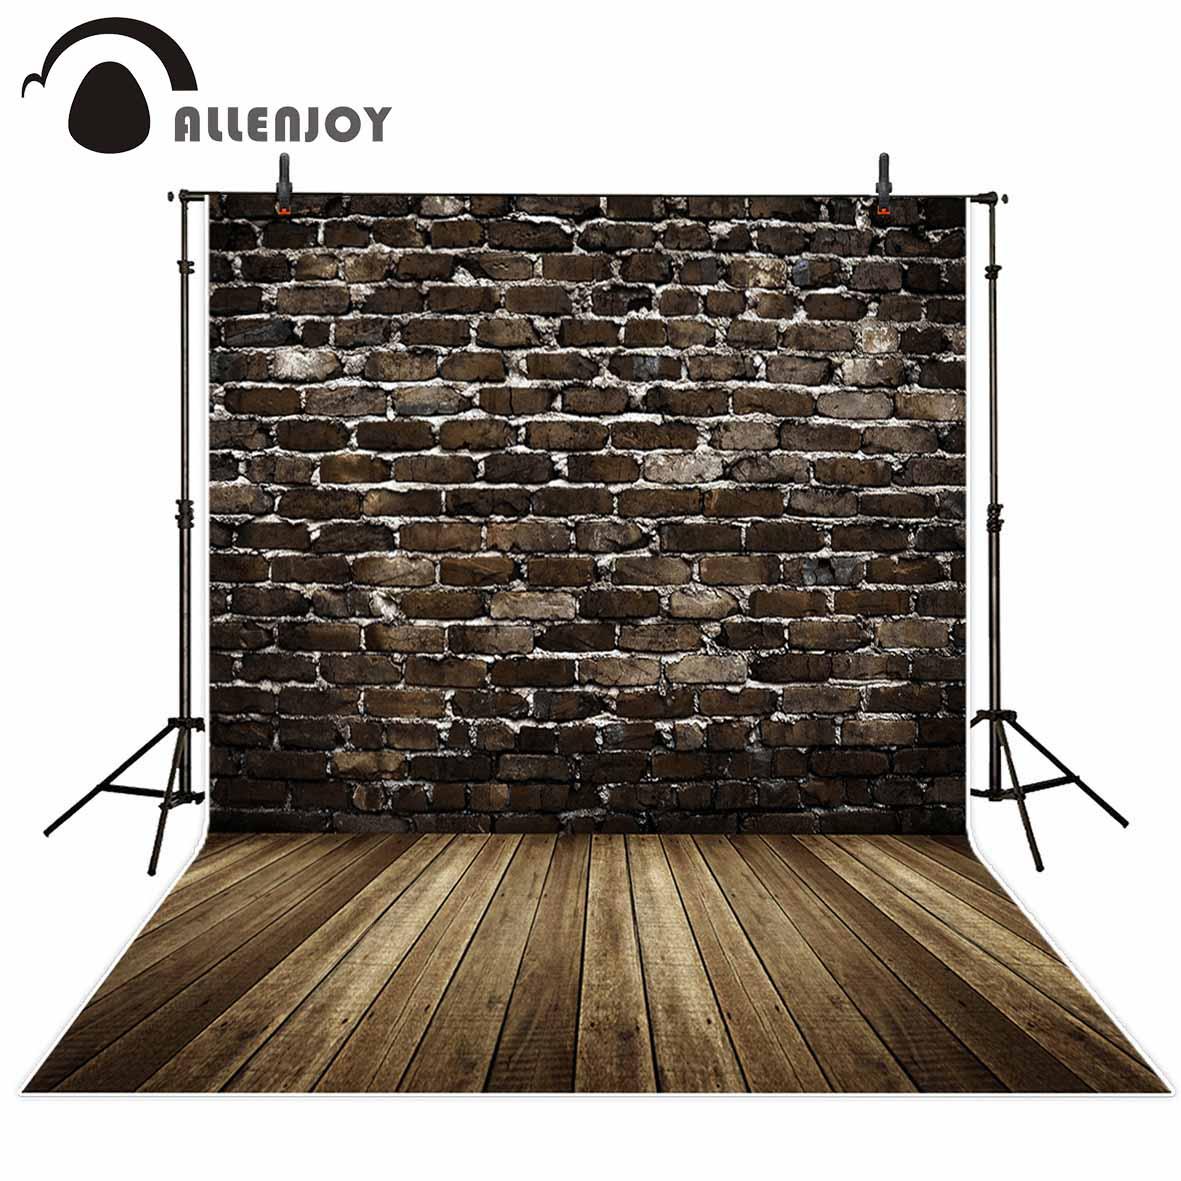 Allenjoy fundos para estúdio de fotos clássico vintage manchado escuro tijolo parede retratos pano de fundo novo design original fantasia adereços